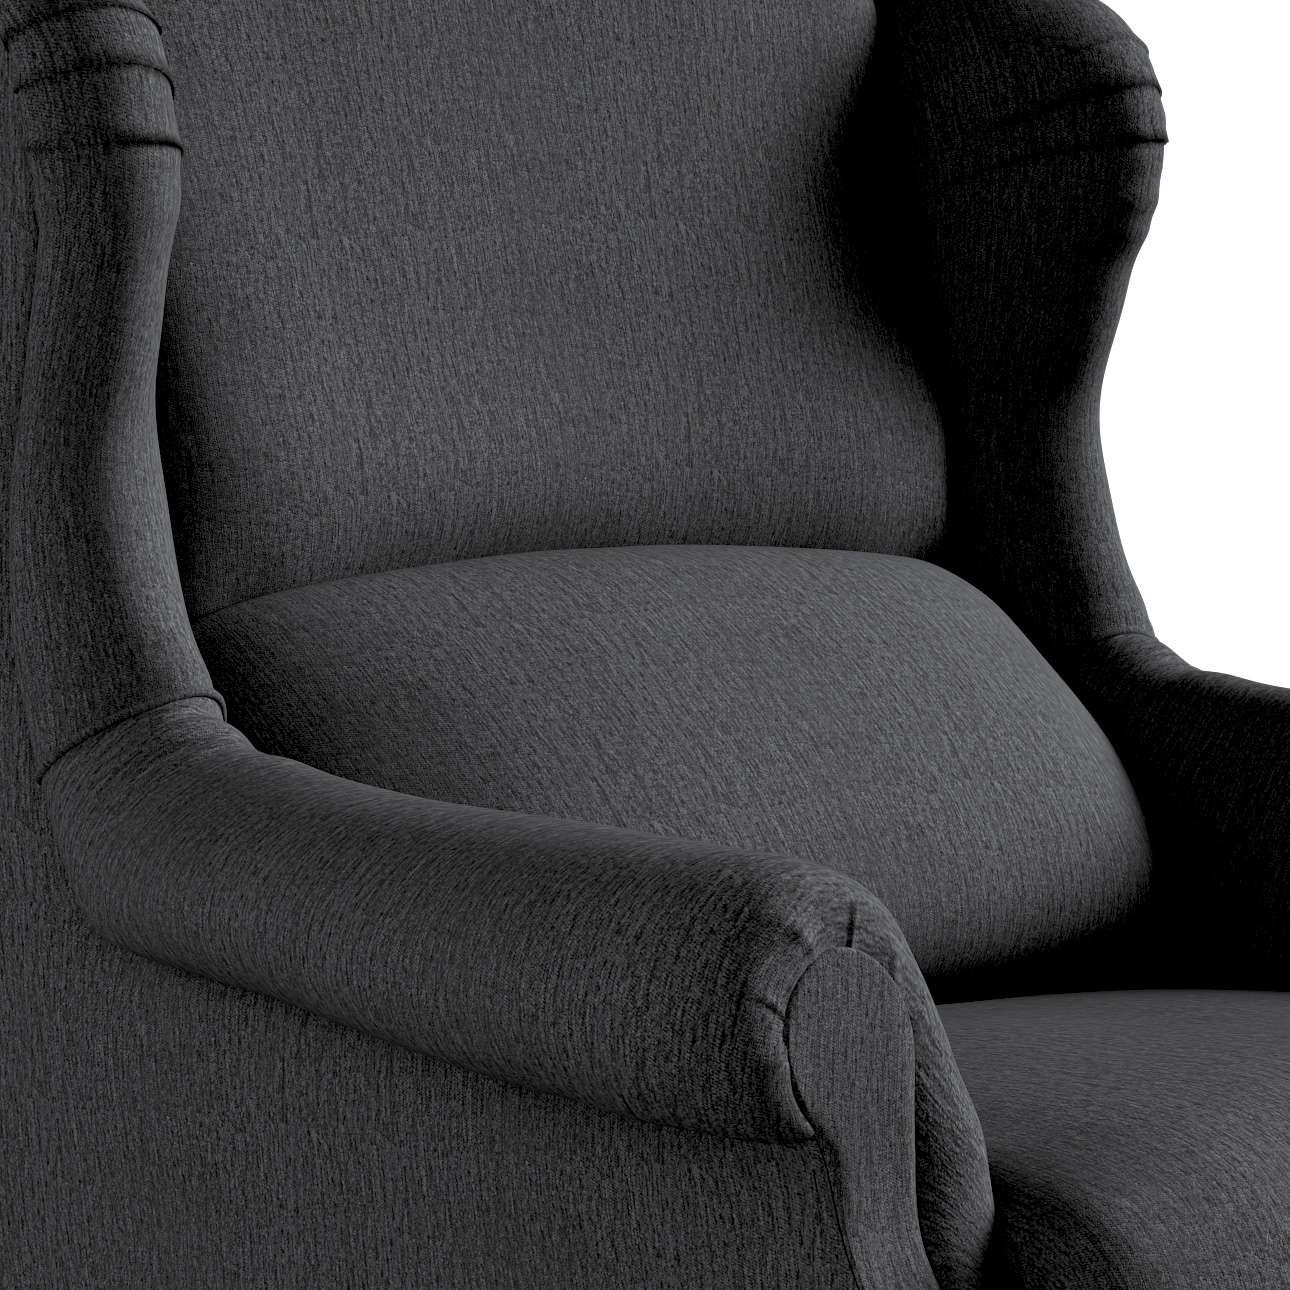 Fotel Unique w kolekcji Chenille, tkanina: 702-20